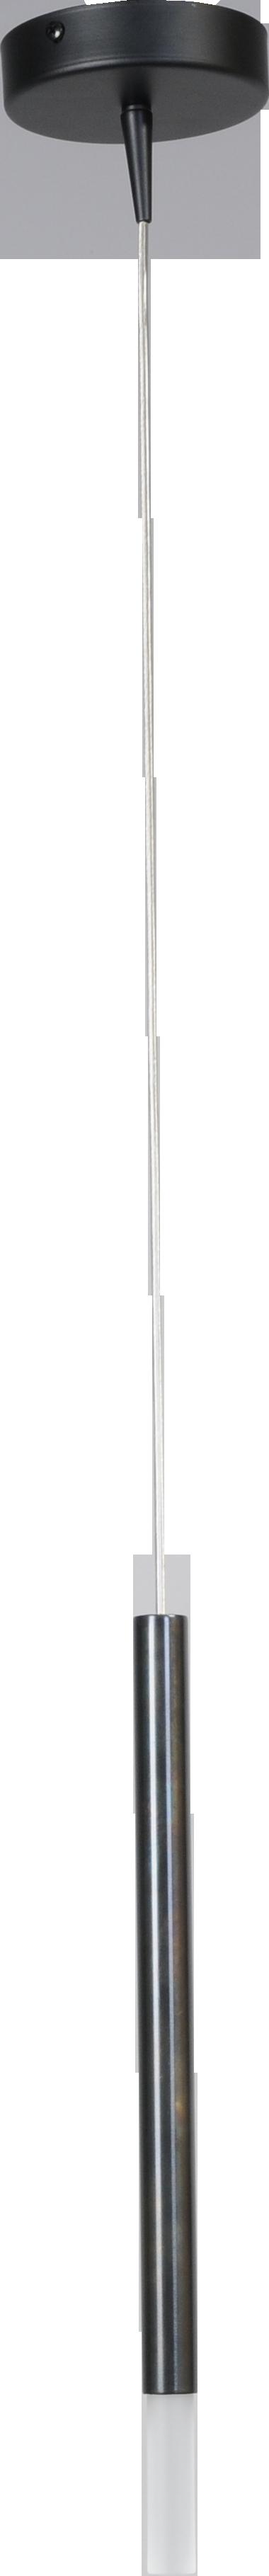 Flute HL FLUTE 1LTS BLACK/DAPPLED OIL